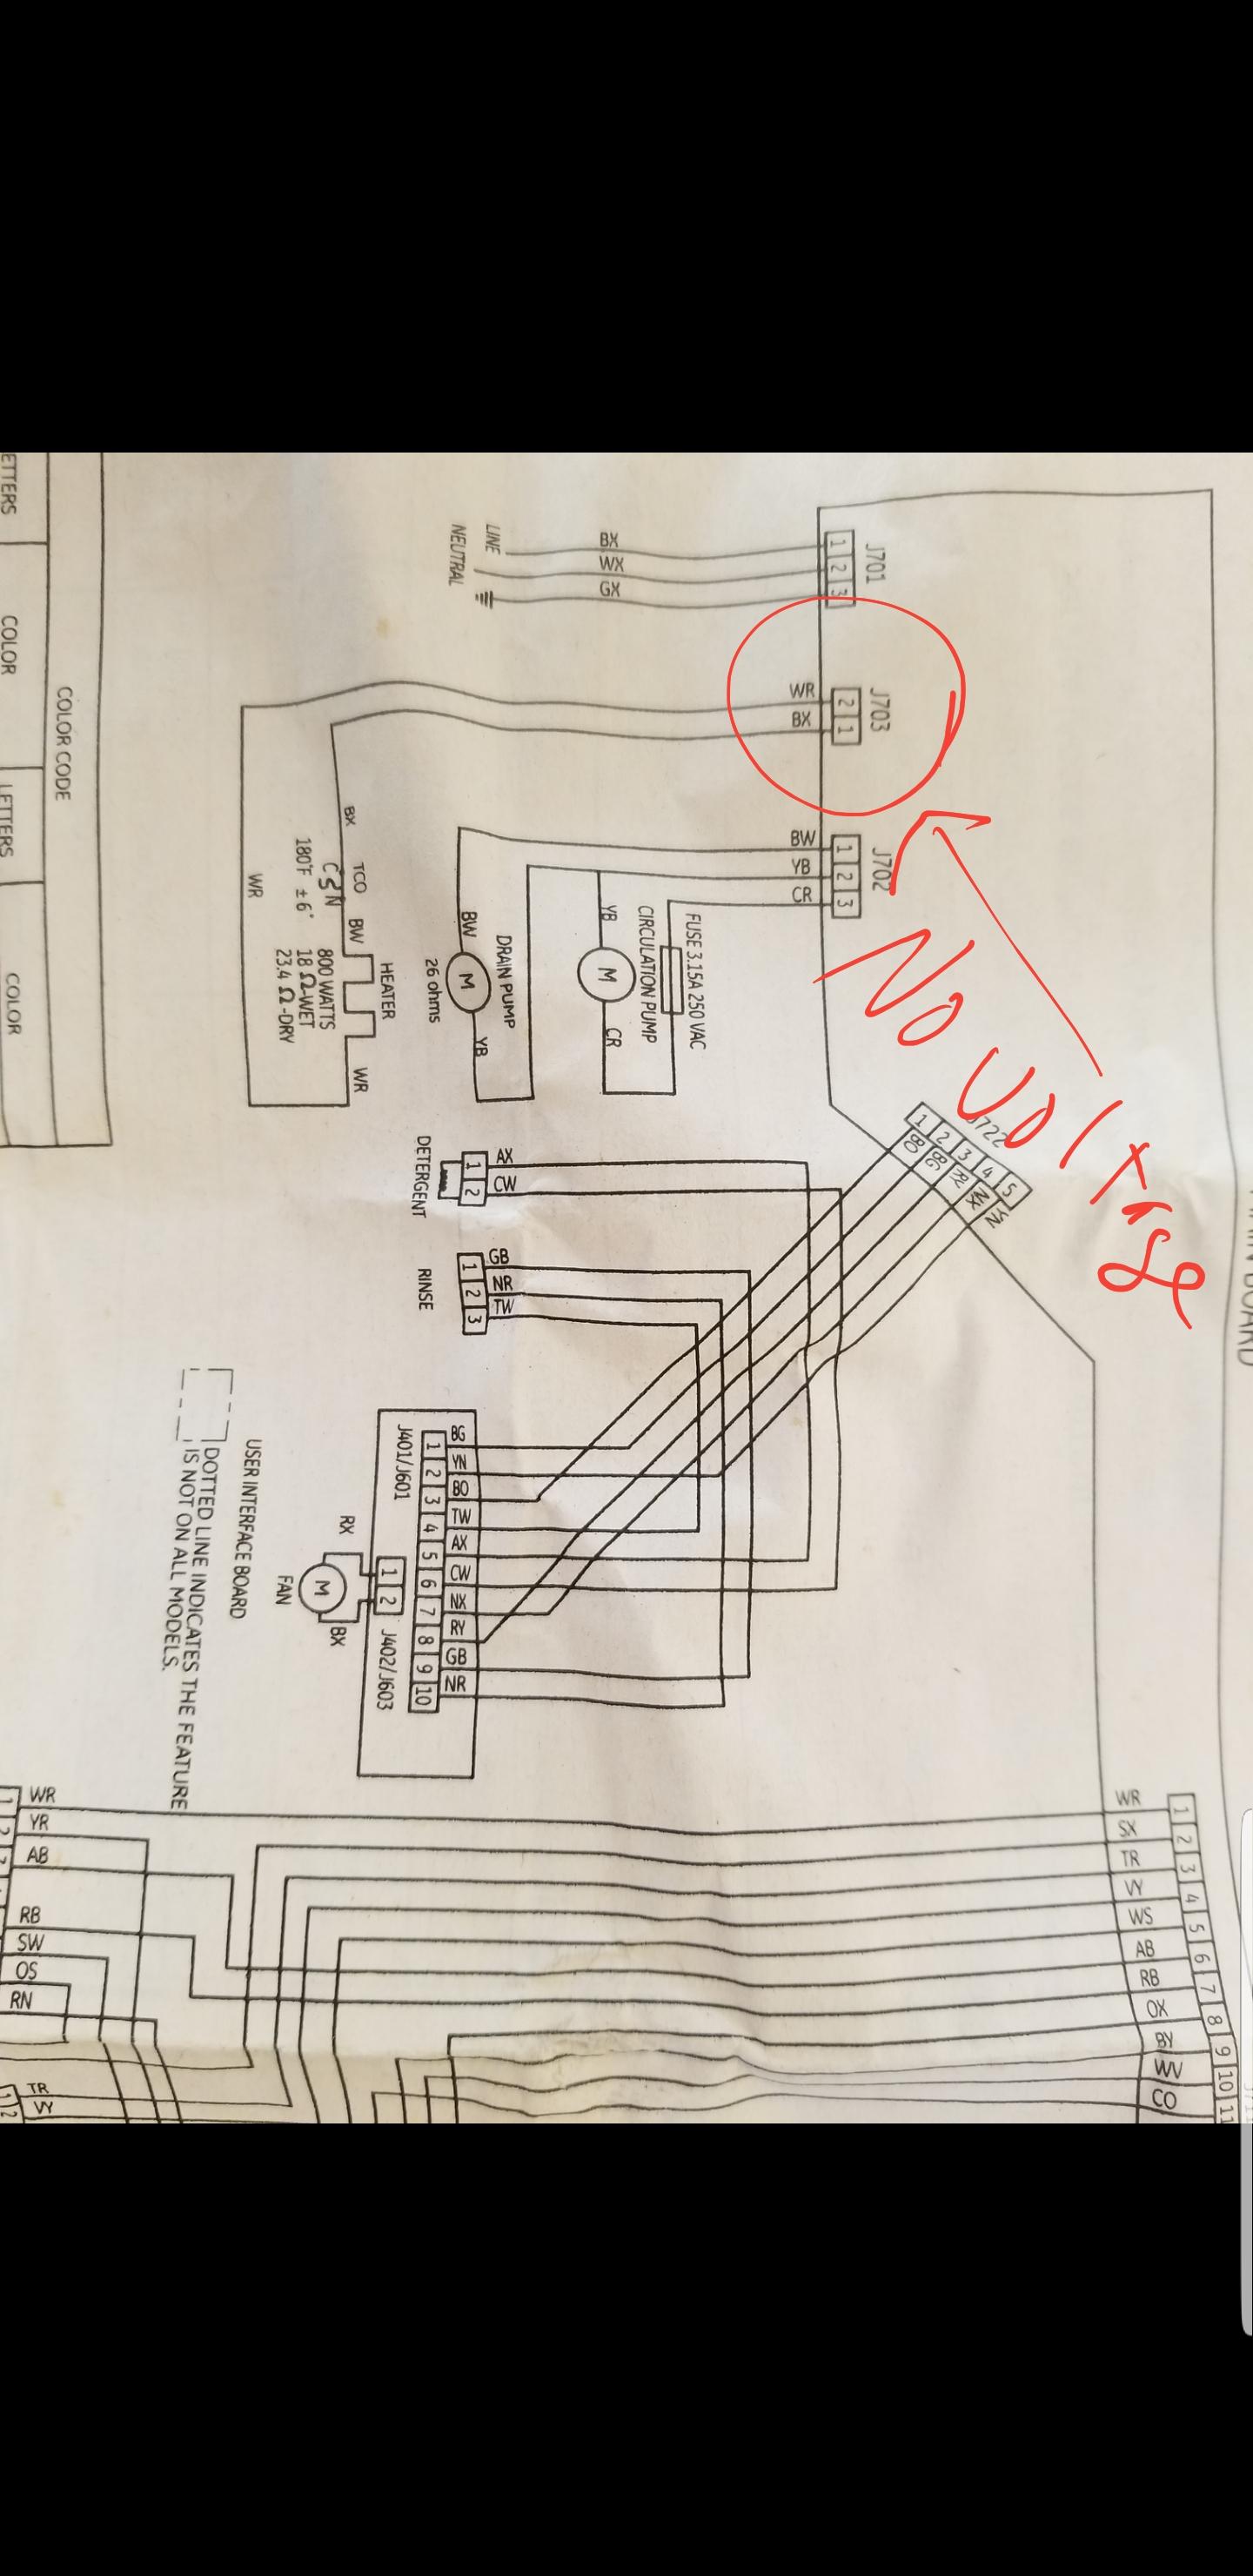 Dishwasher Parts Searspartsdirect On Maytag Dishwasher Wiring Harness